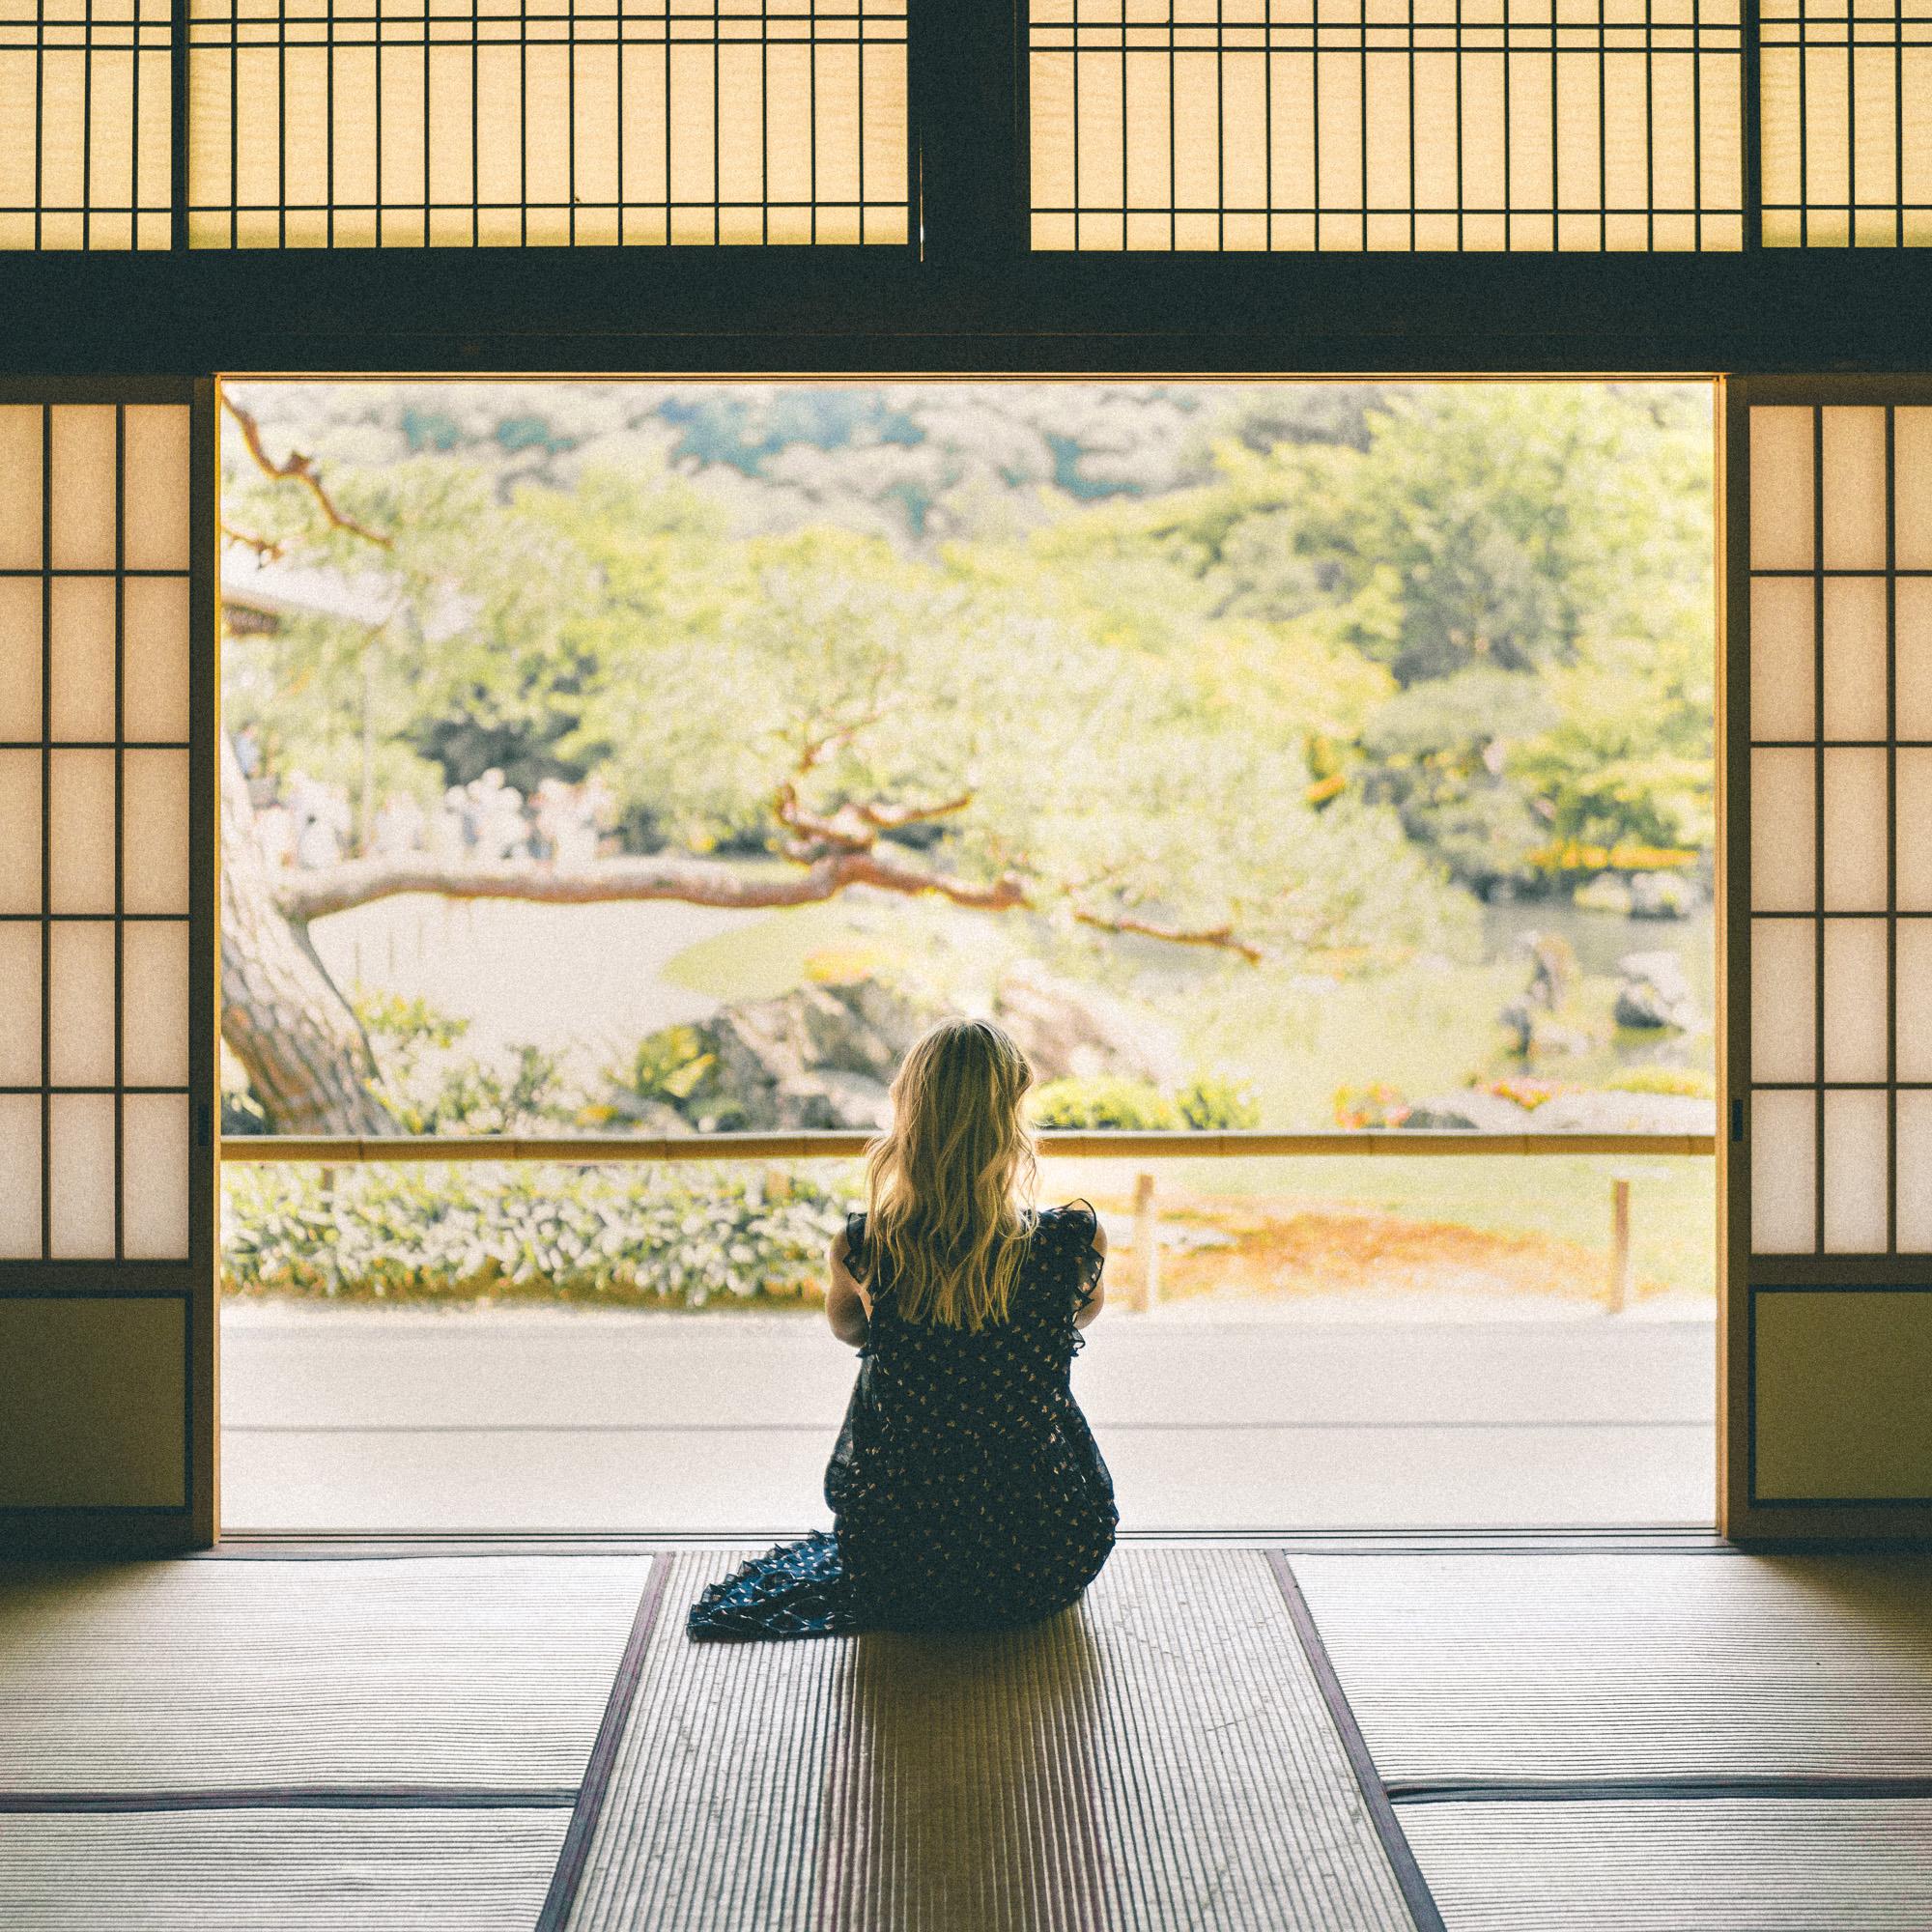 Tenryu-ji Japanese Temple in Kyoto, Japan | 24 Hour Guide to Kyoto, Japan | 1 Day Guide Kyoto | Kyoto City Guide | Kyoto Travel Itinerary